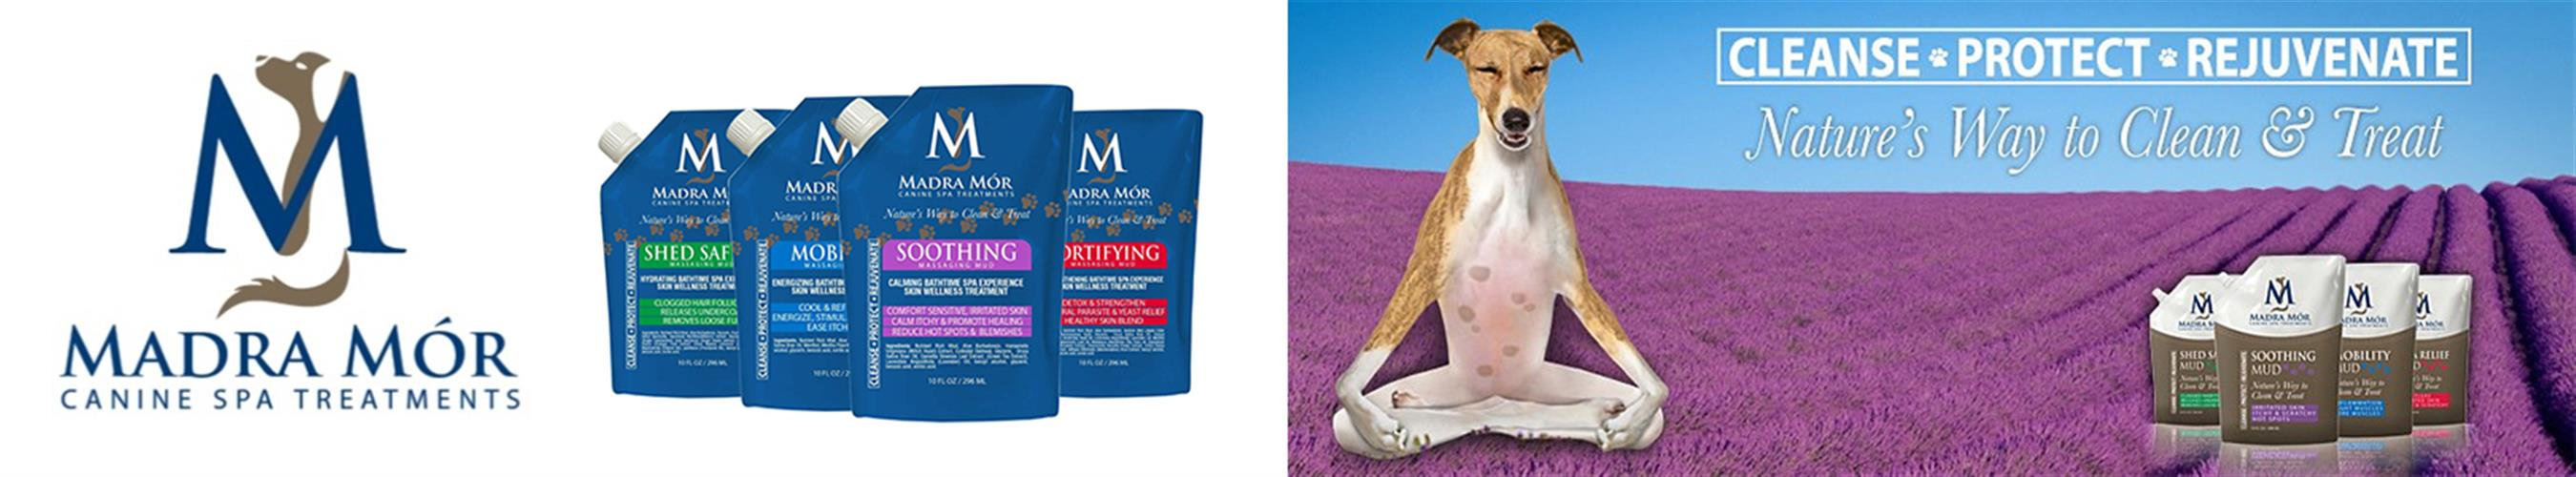 Madra Mór Canine Spa Treatments